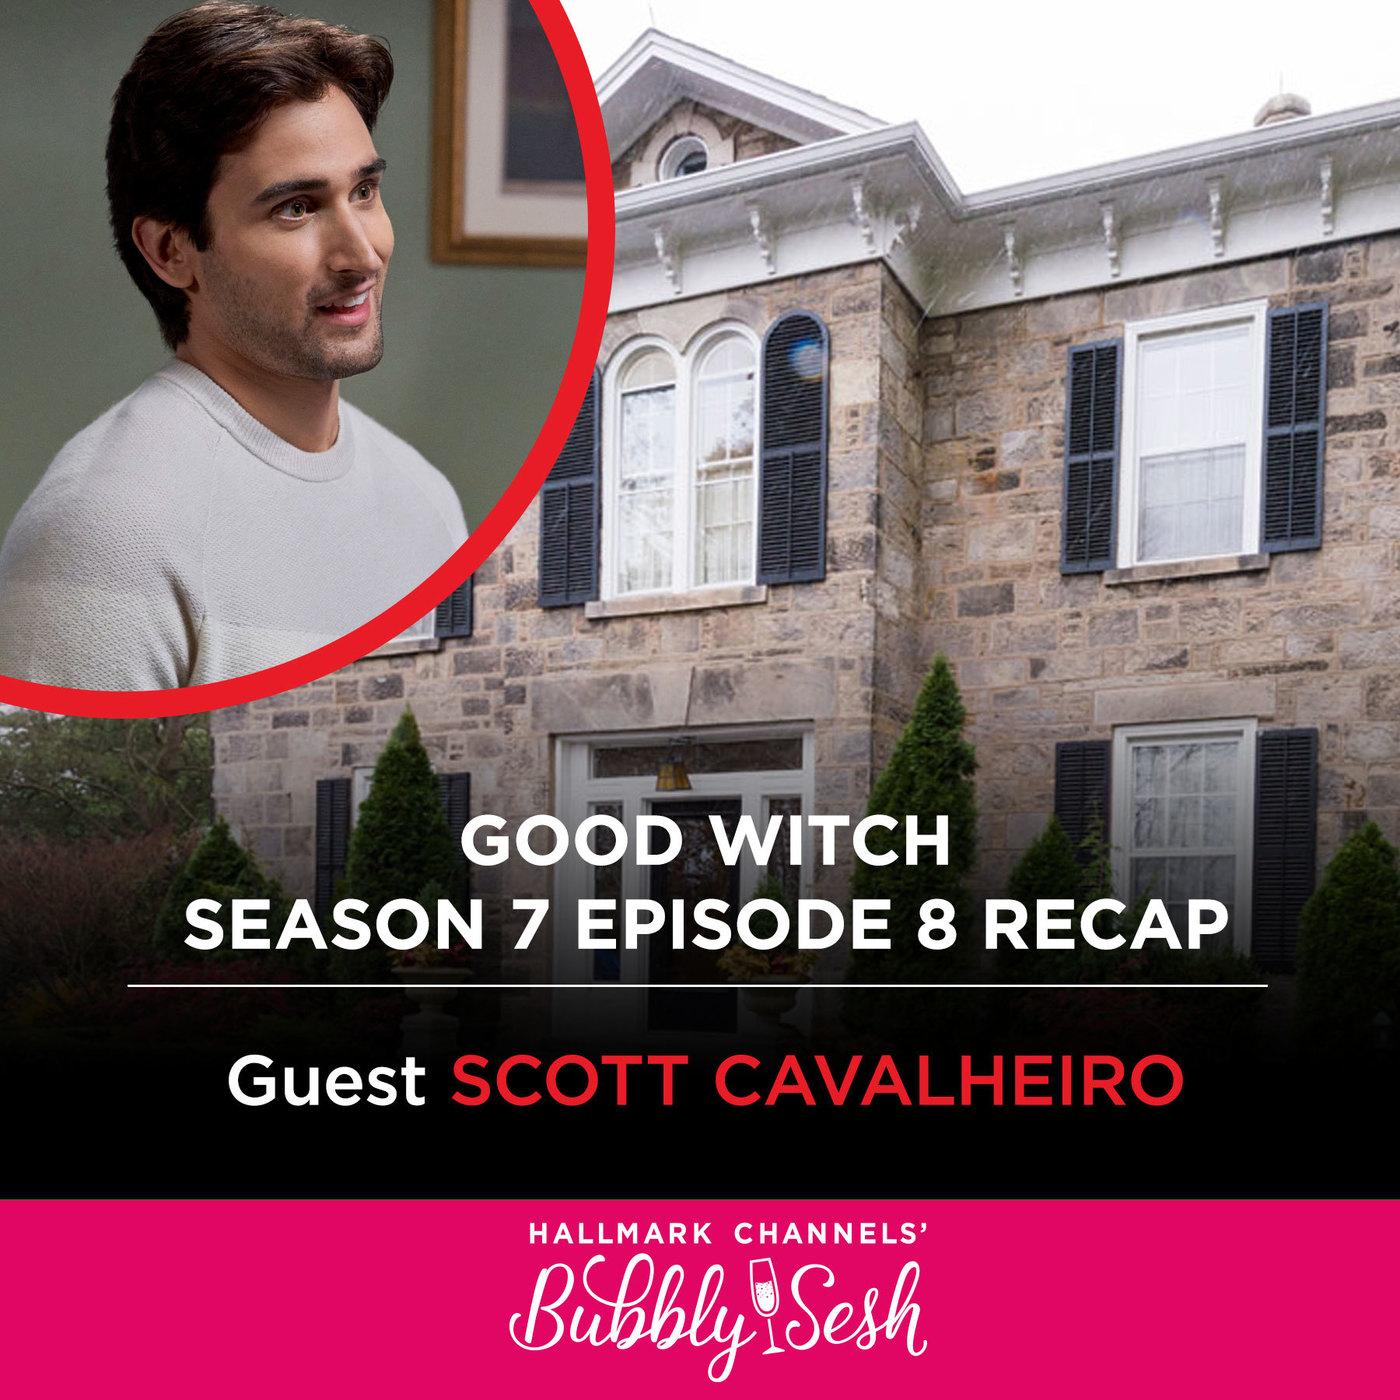 Good Witch Season 7 Episode 8 Recap with Guest Scott Cavalheiro